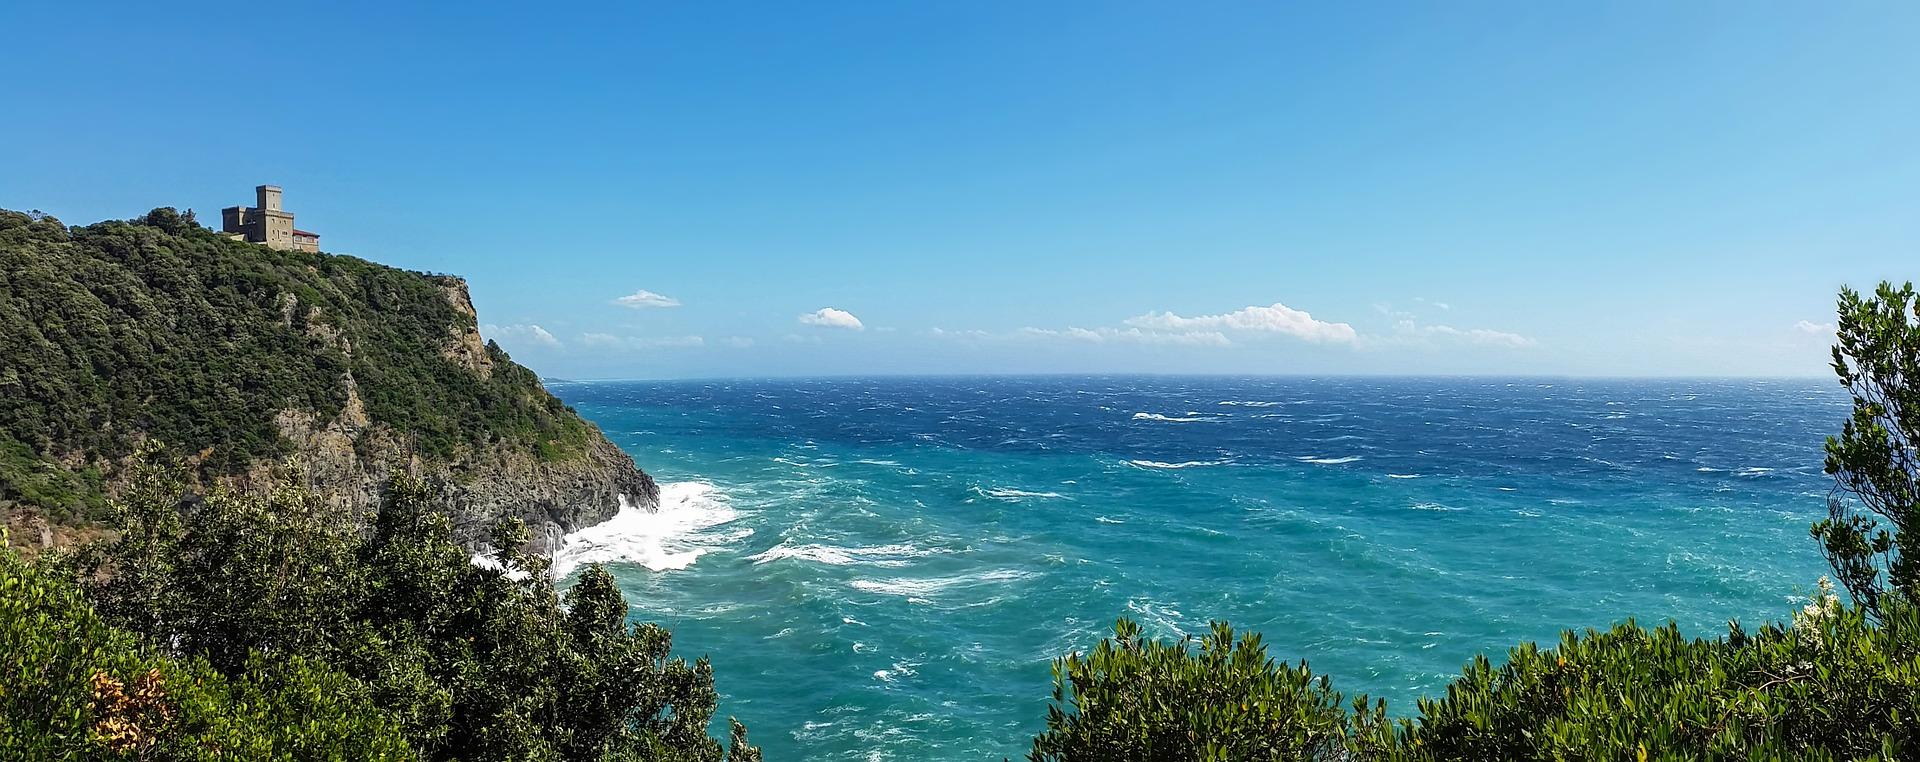 italy sea side